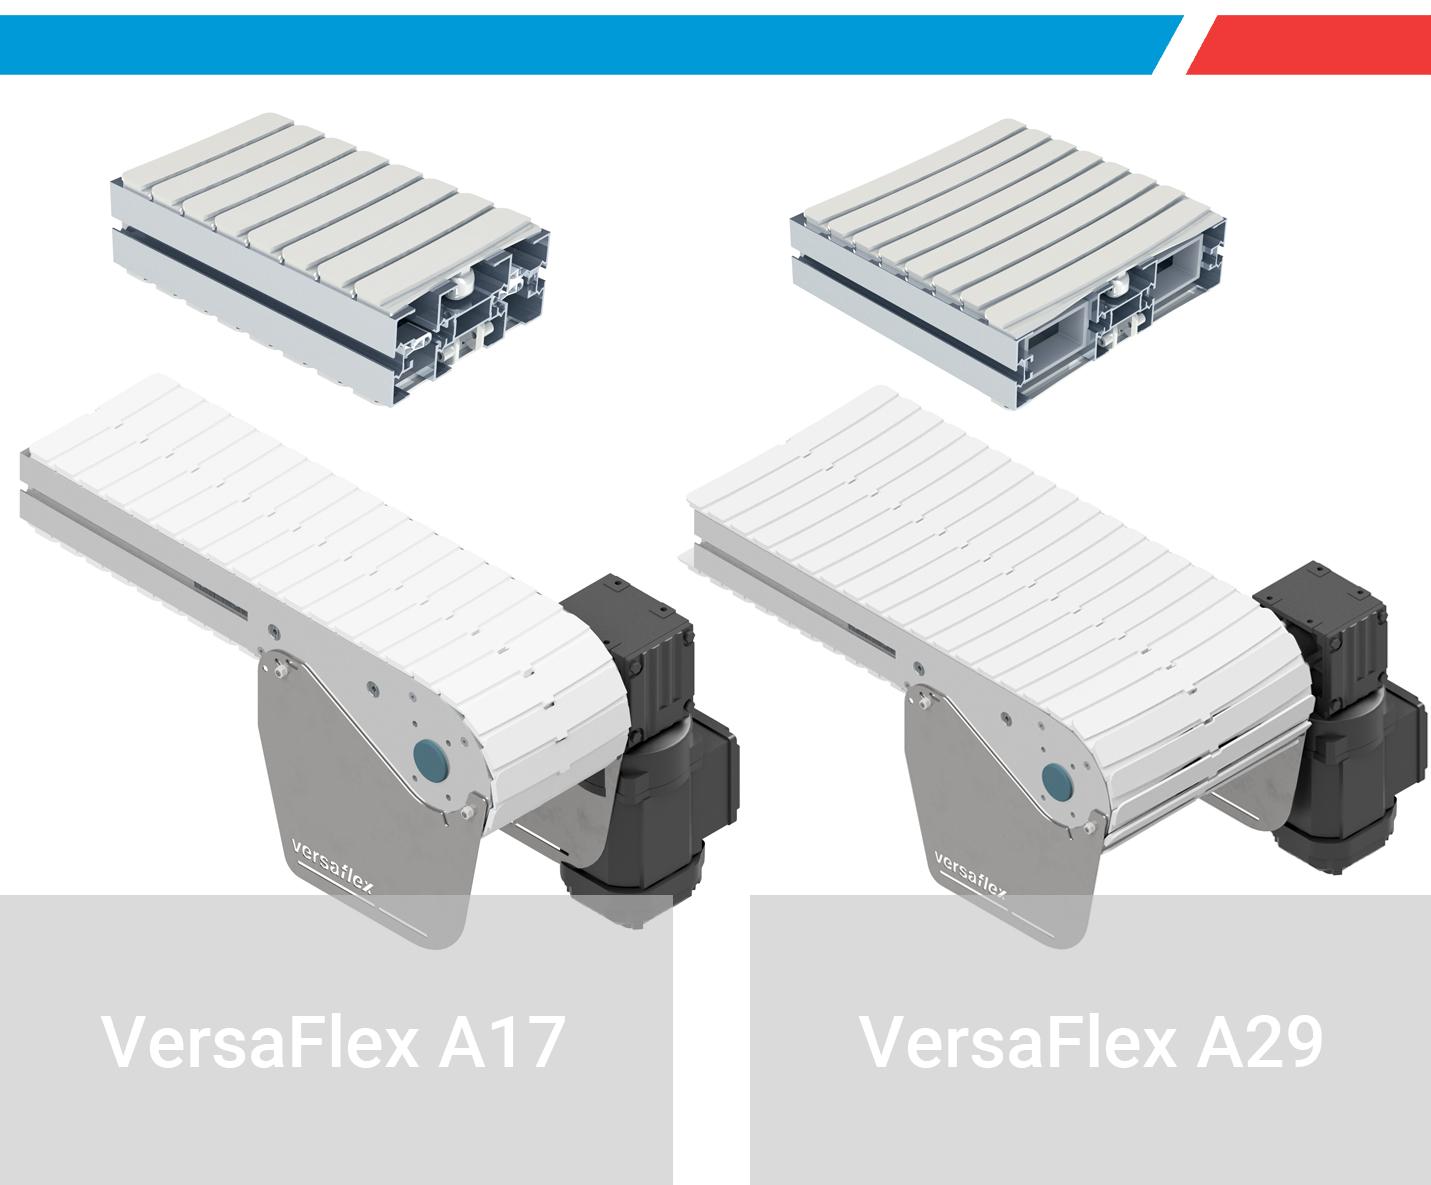 mk North America Adds New Conveyor Models to VersaFlex Line